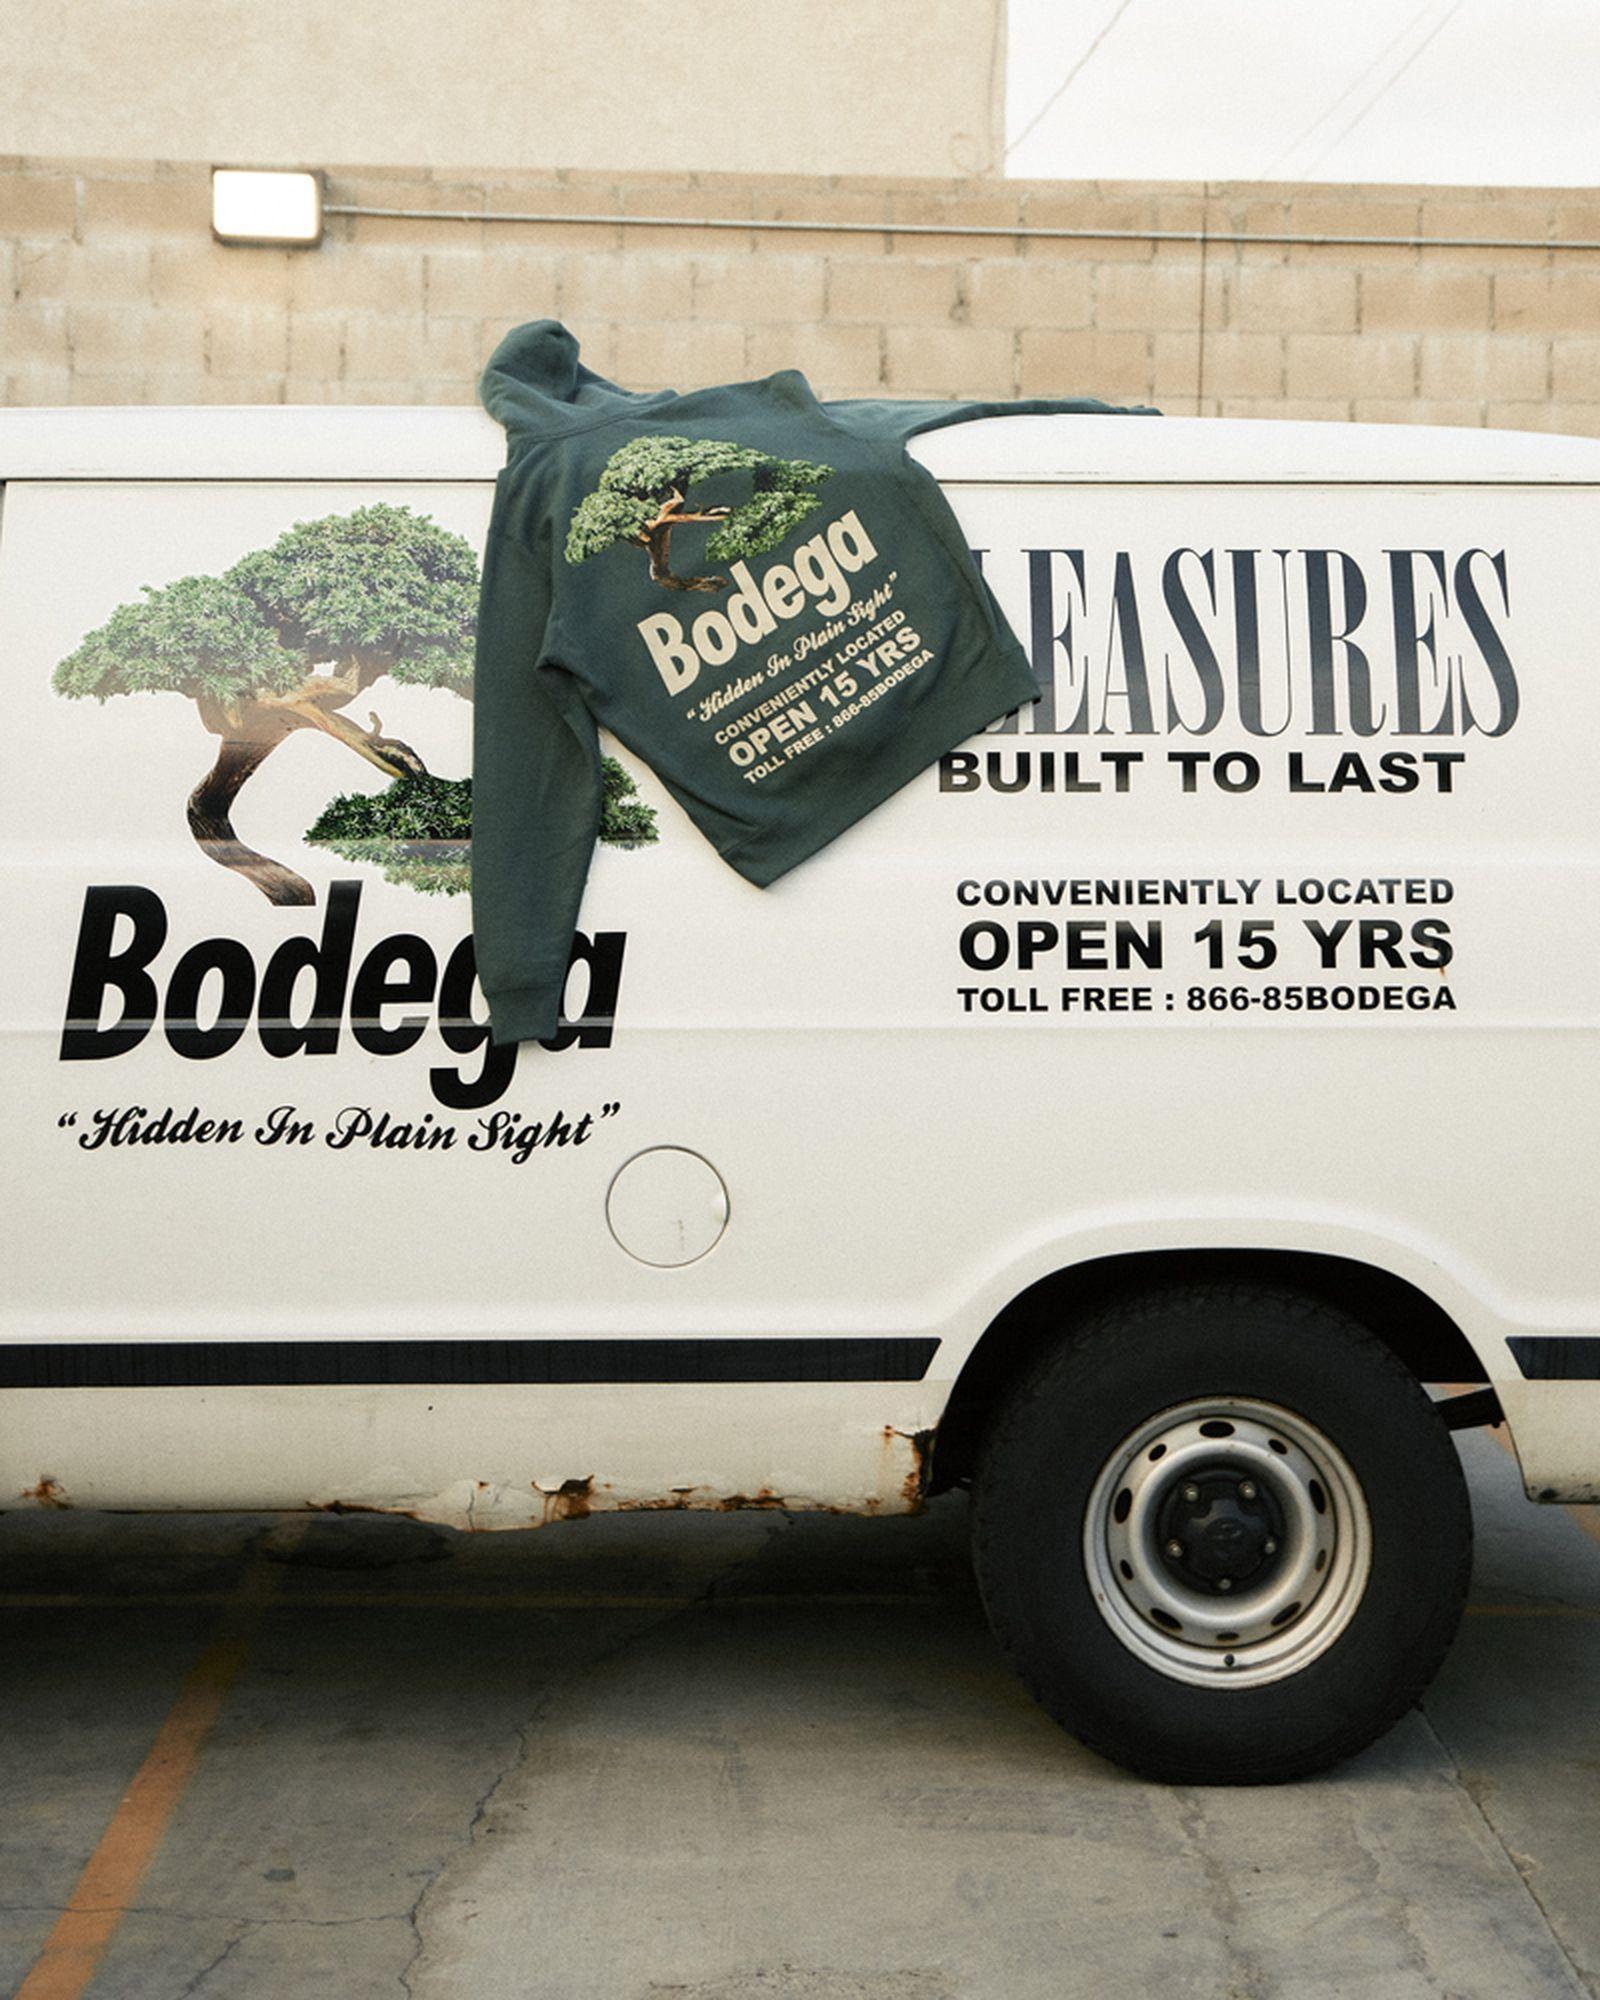 bodega-pleasures-anniversary-capsule-collection-14